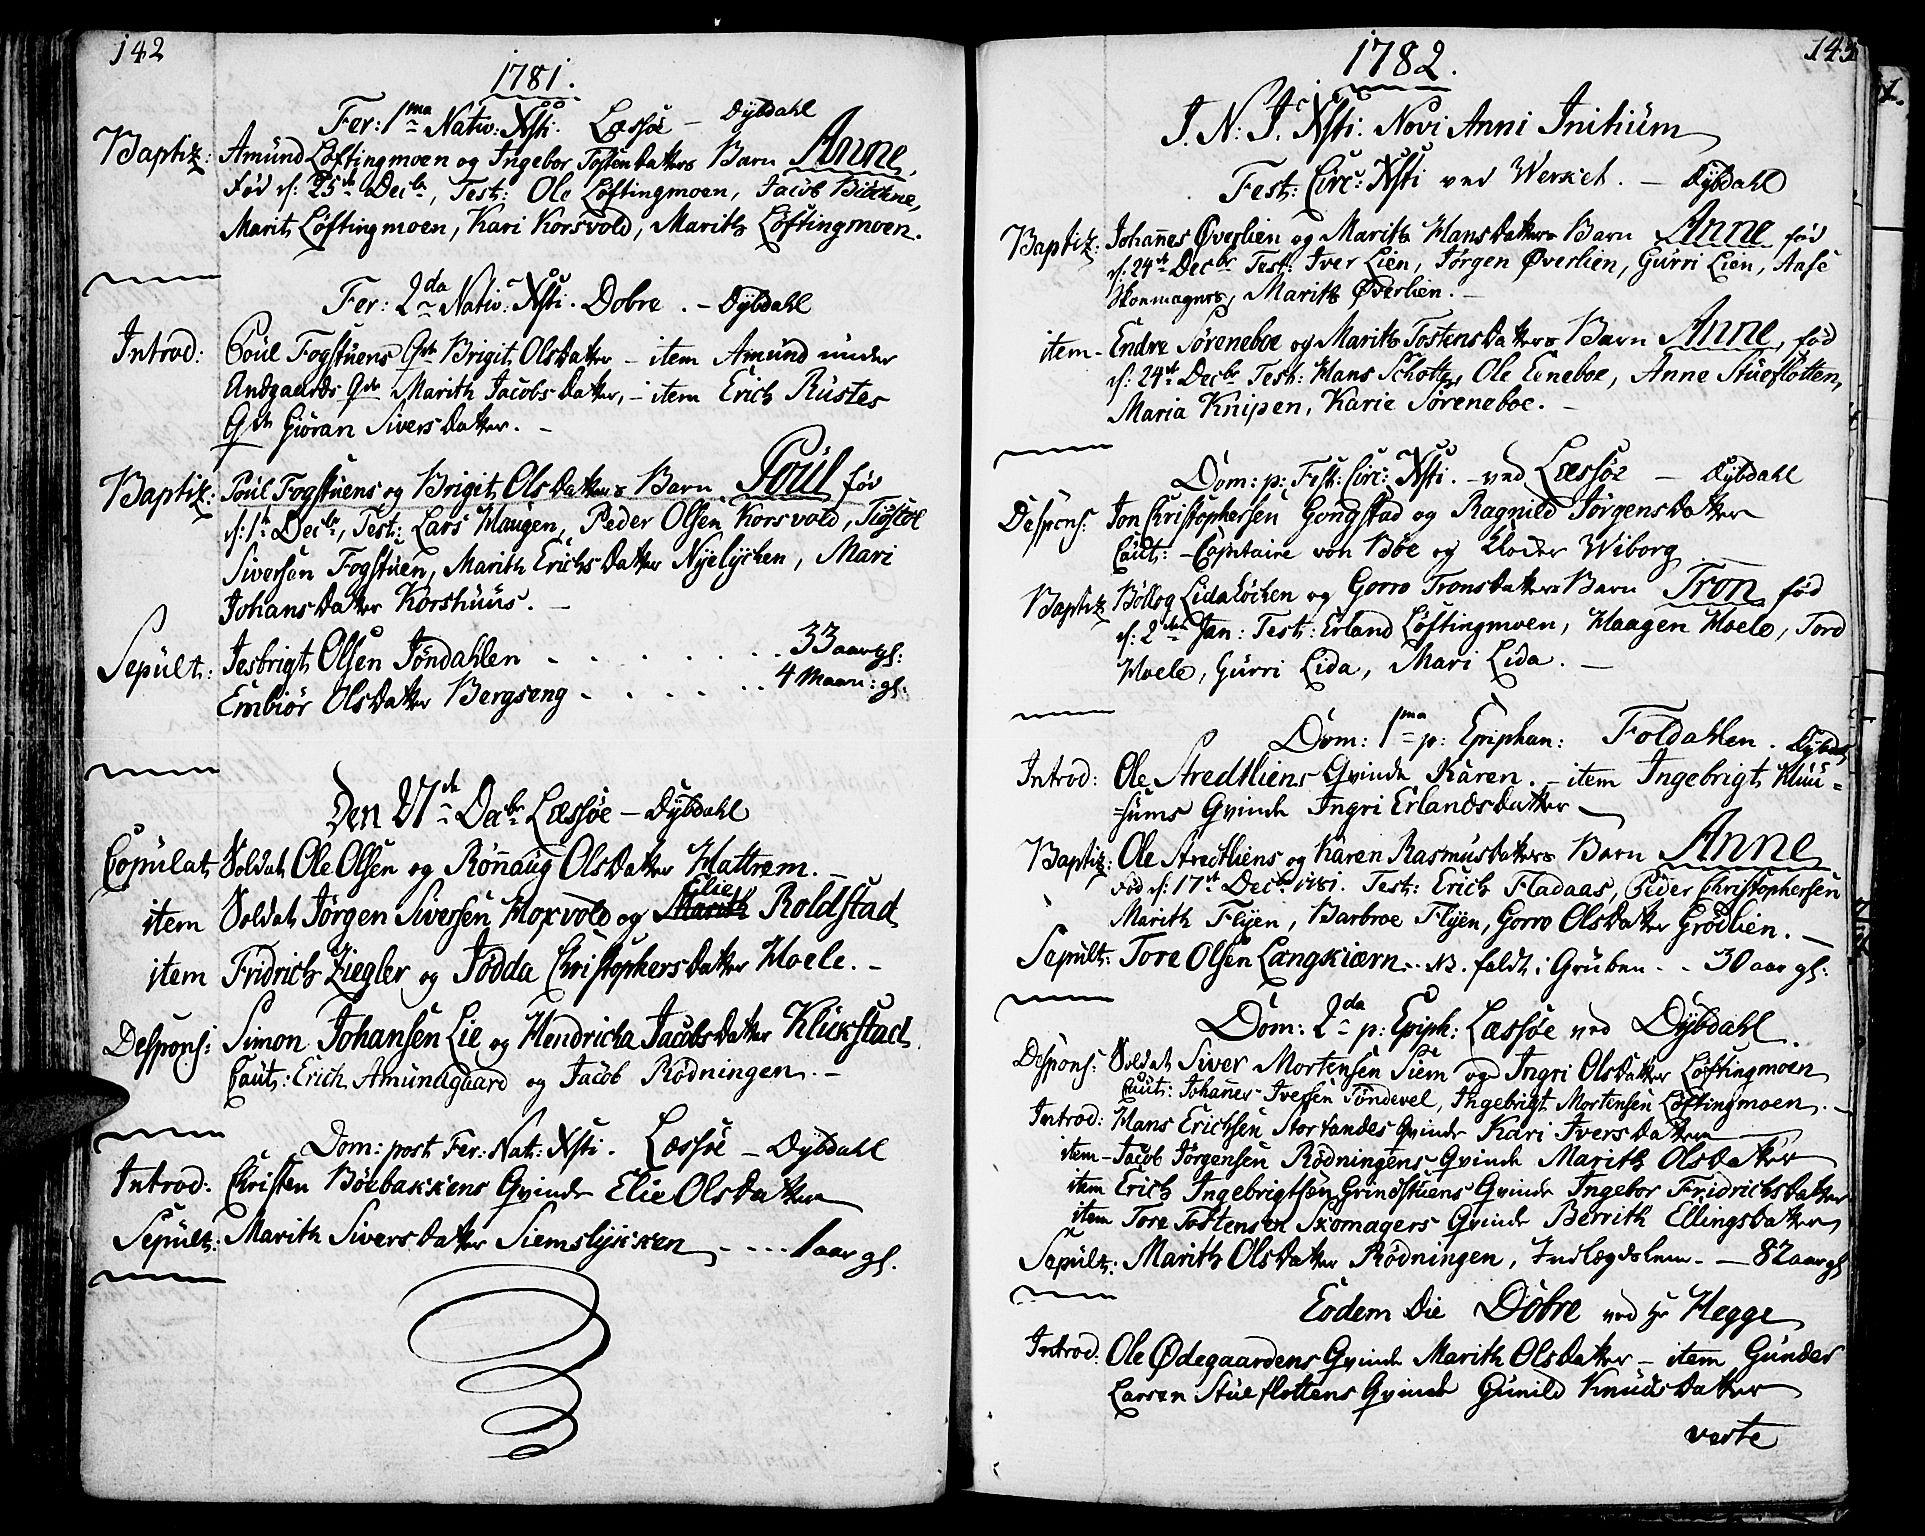 SAH, Lesja prestekontor, Ministerialbok nr. 3, 1777-1819, s. 142-143